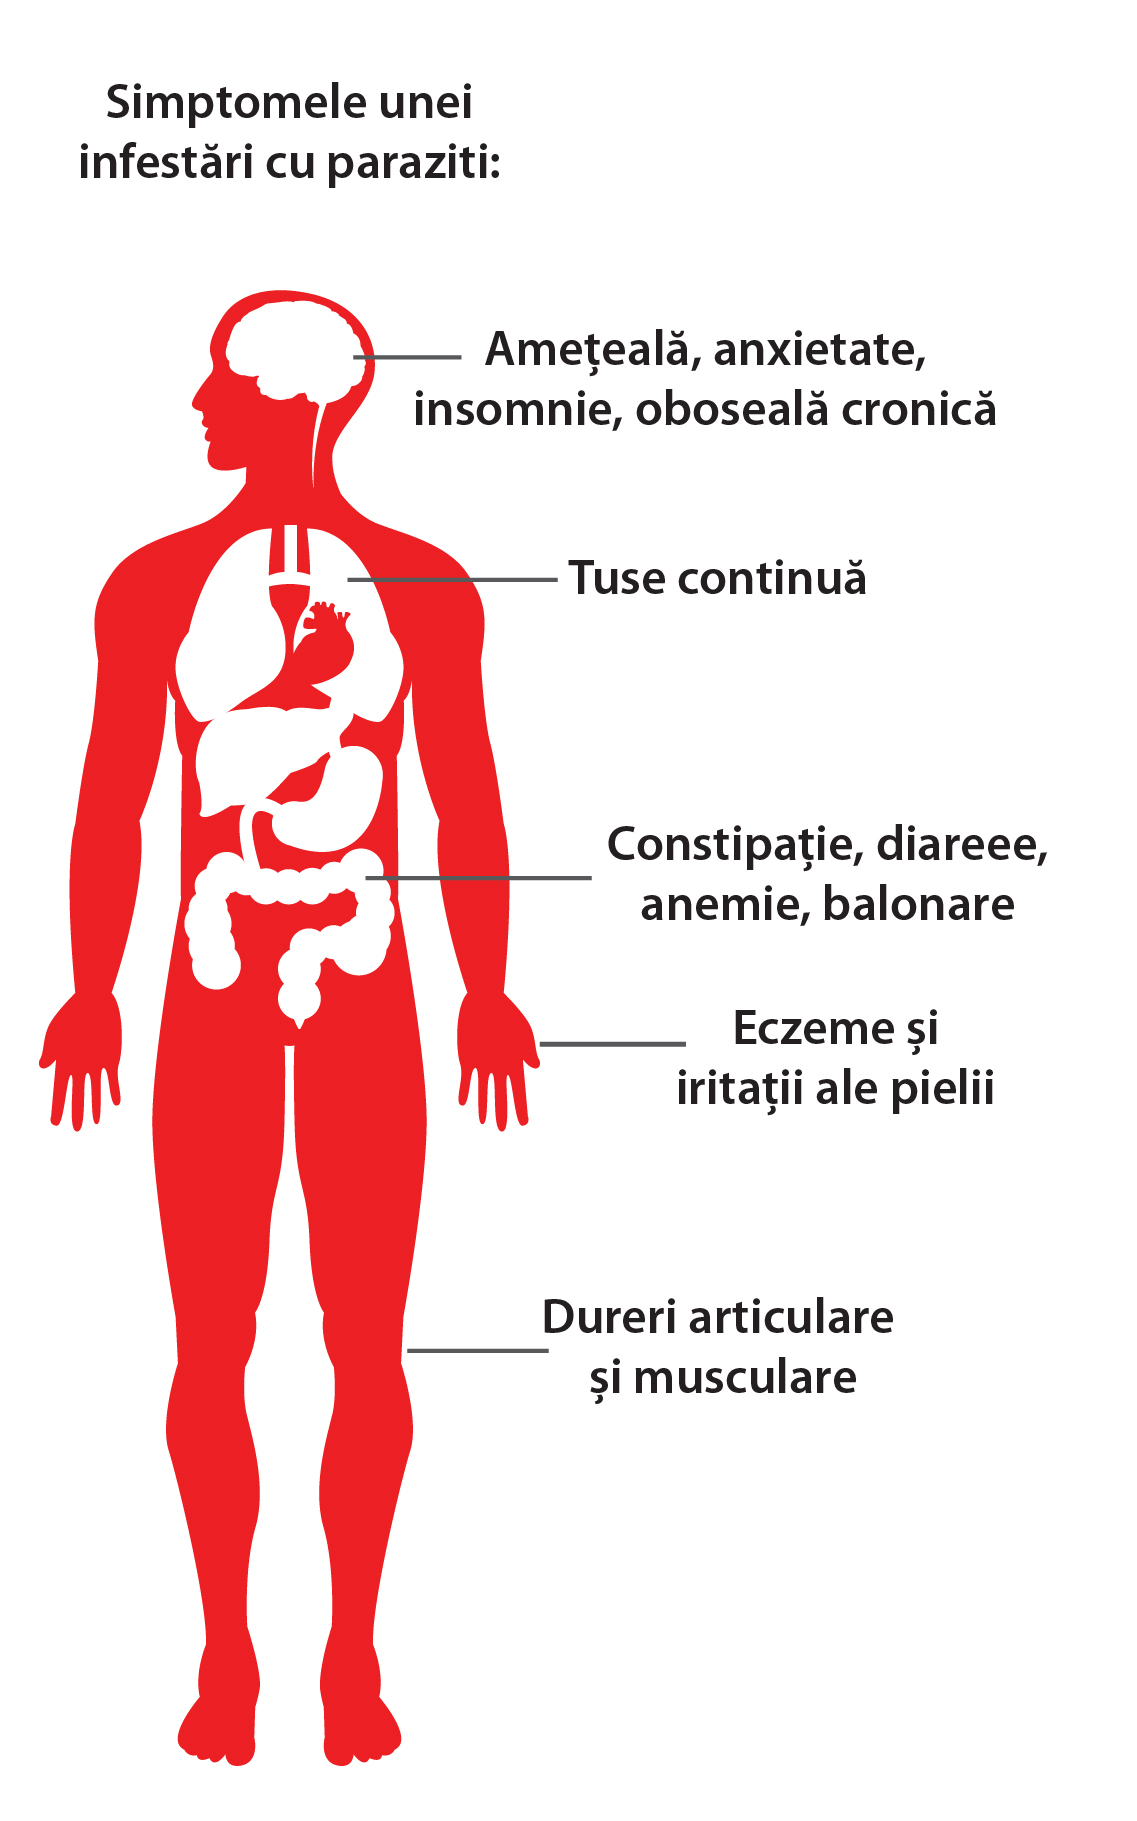 paraziti biliari papilloma virus tumore